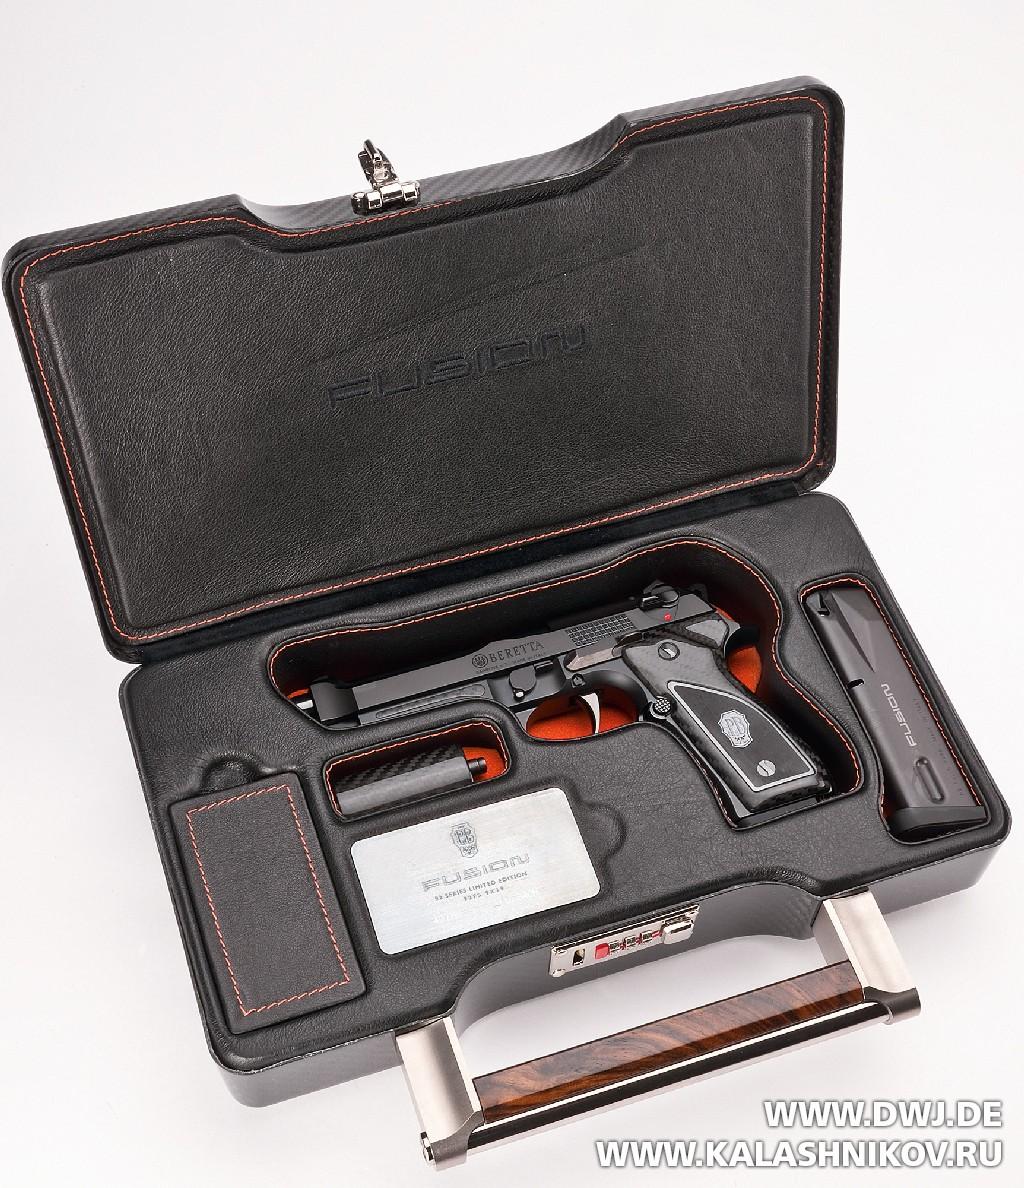 Пистолет Beretta 92FS Fusion Black. Кейс. DWJ. Журнал Калашников